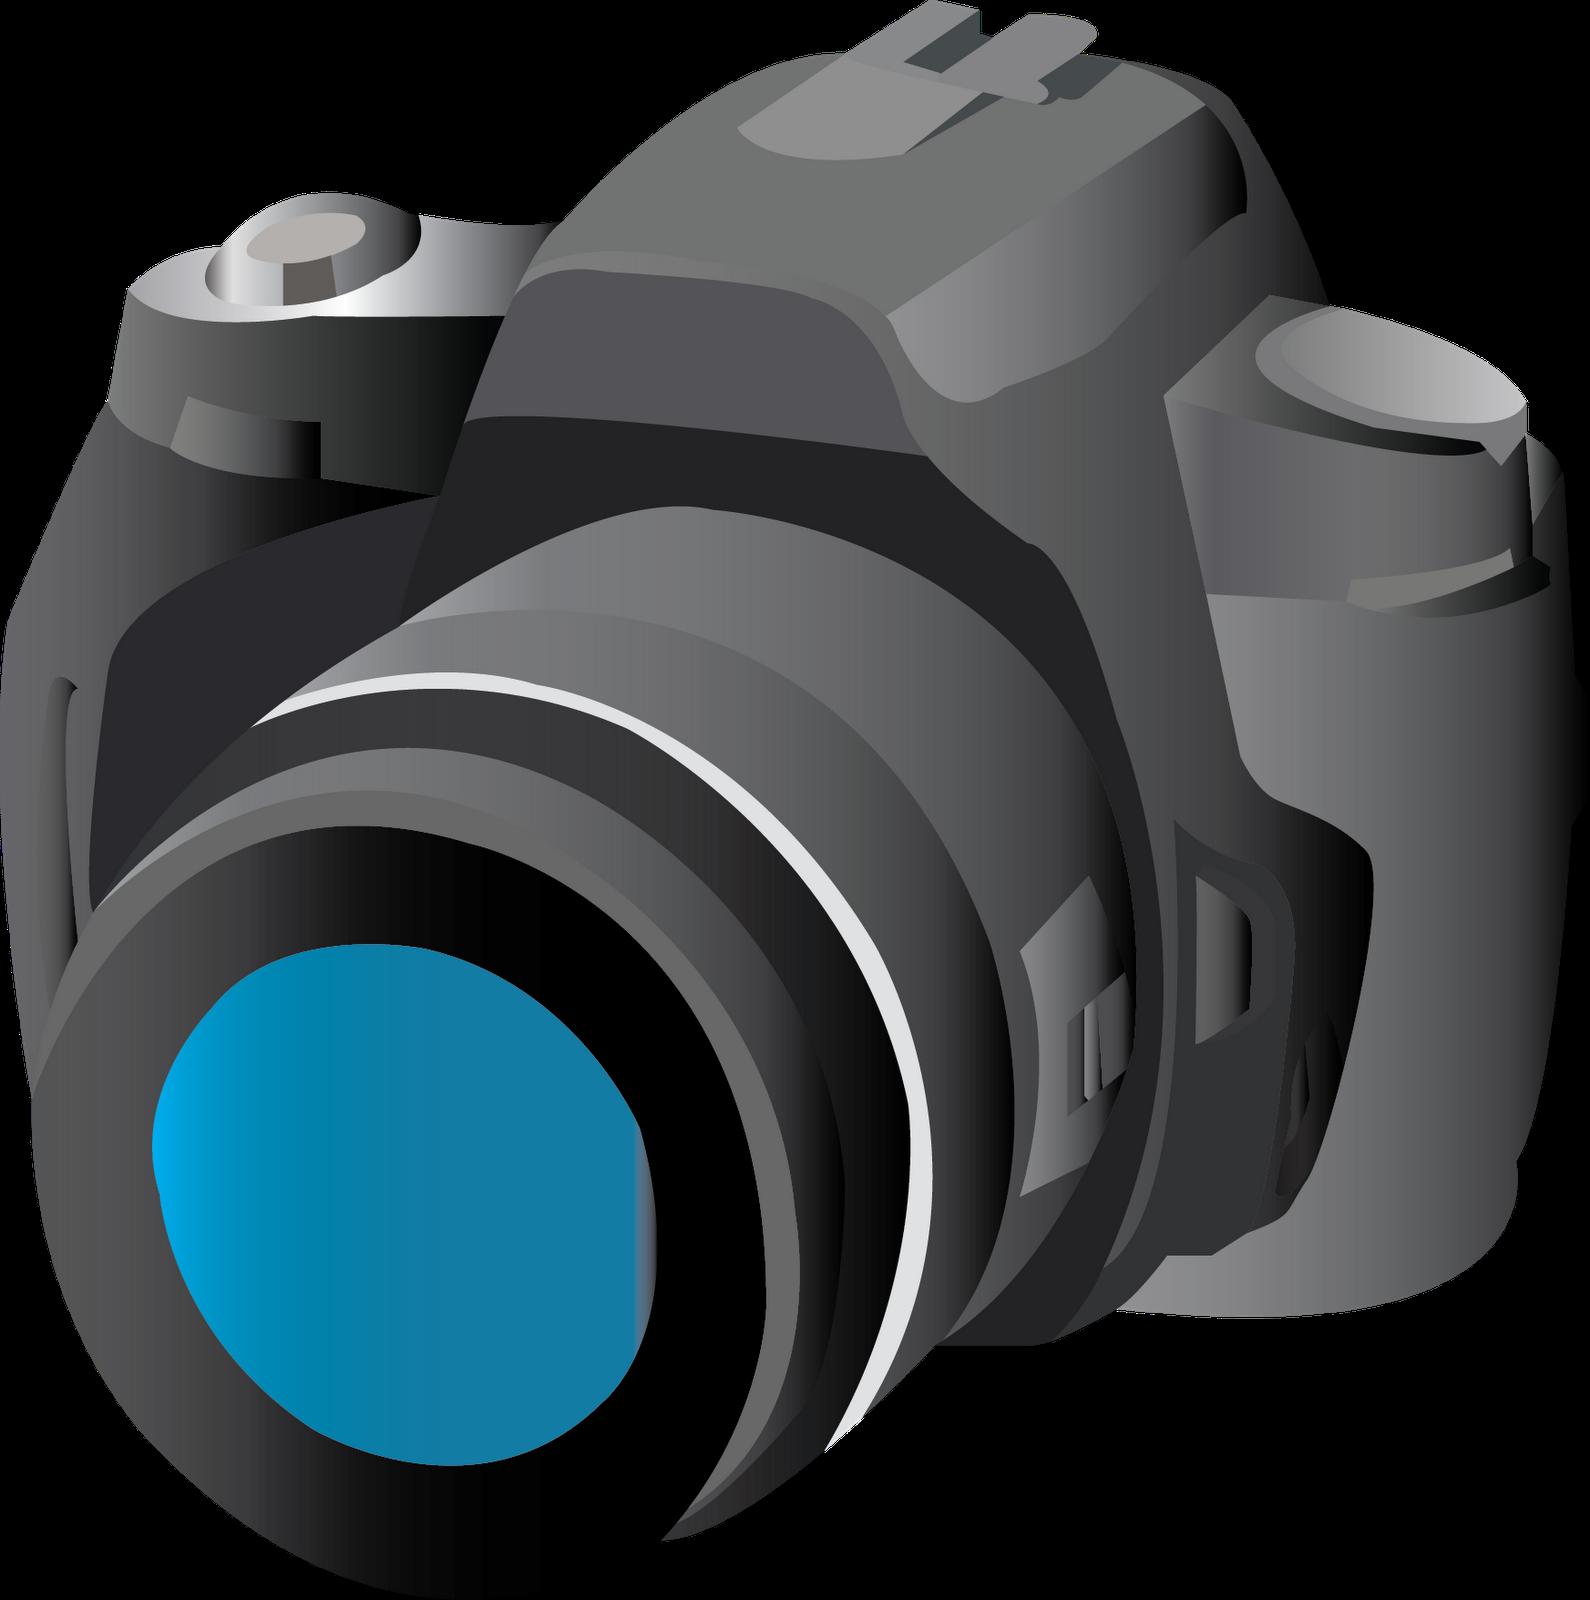 camera clipart png – Clipart Download